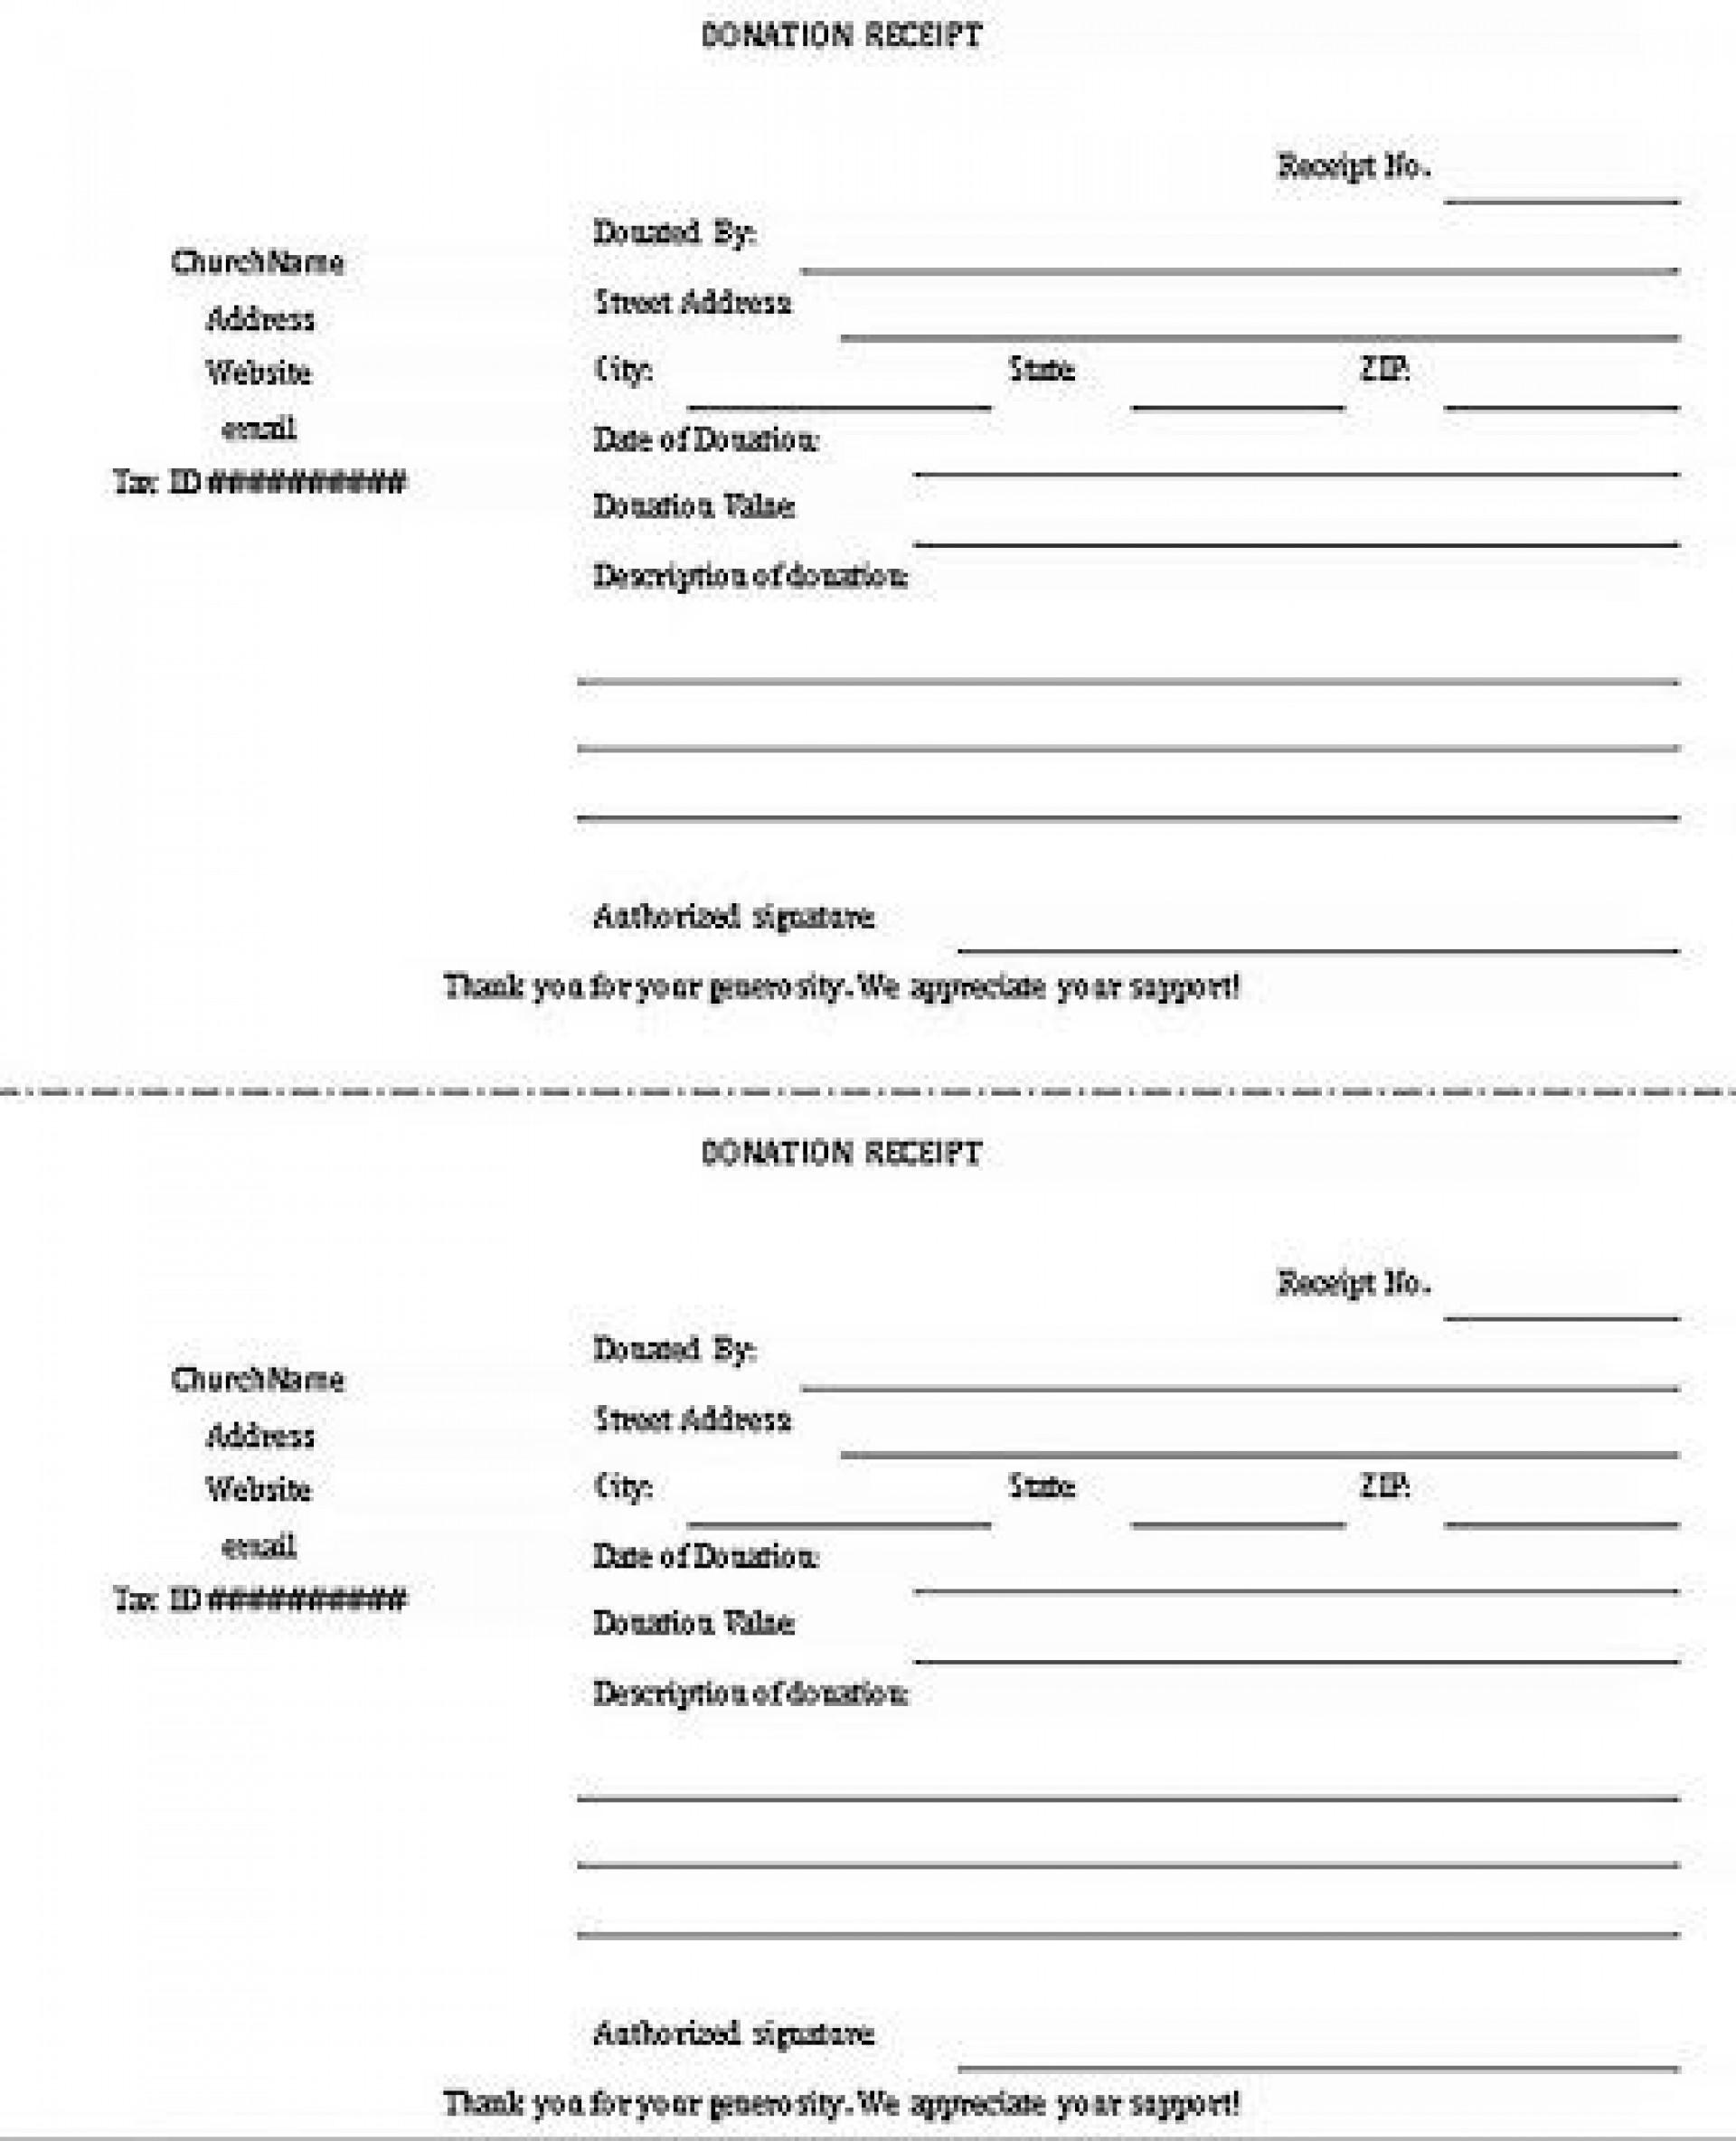 009 Phenomenal Charitable Tax Receipt Template Sample  Donation1920